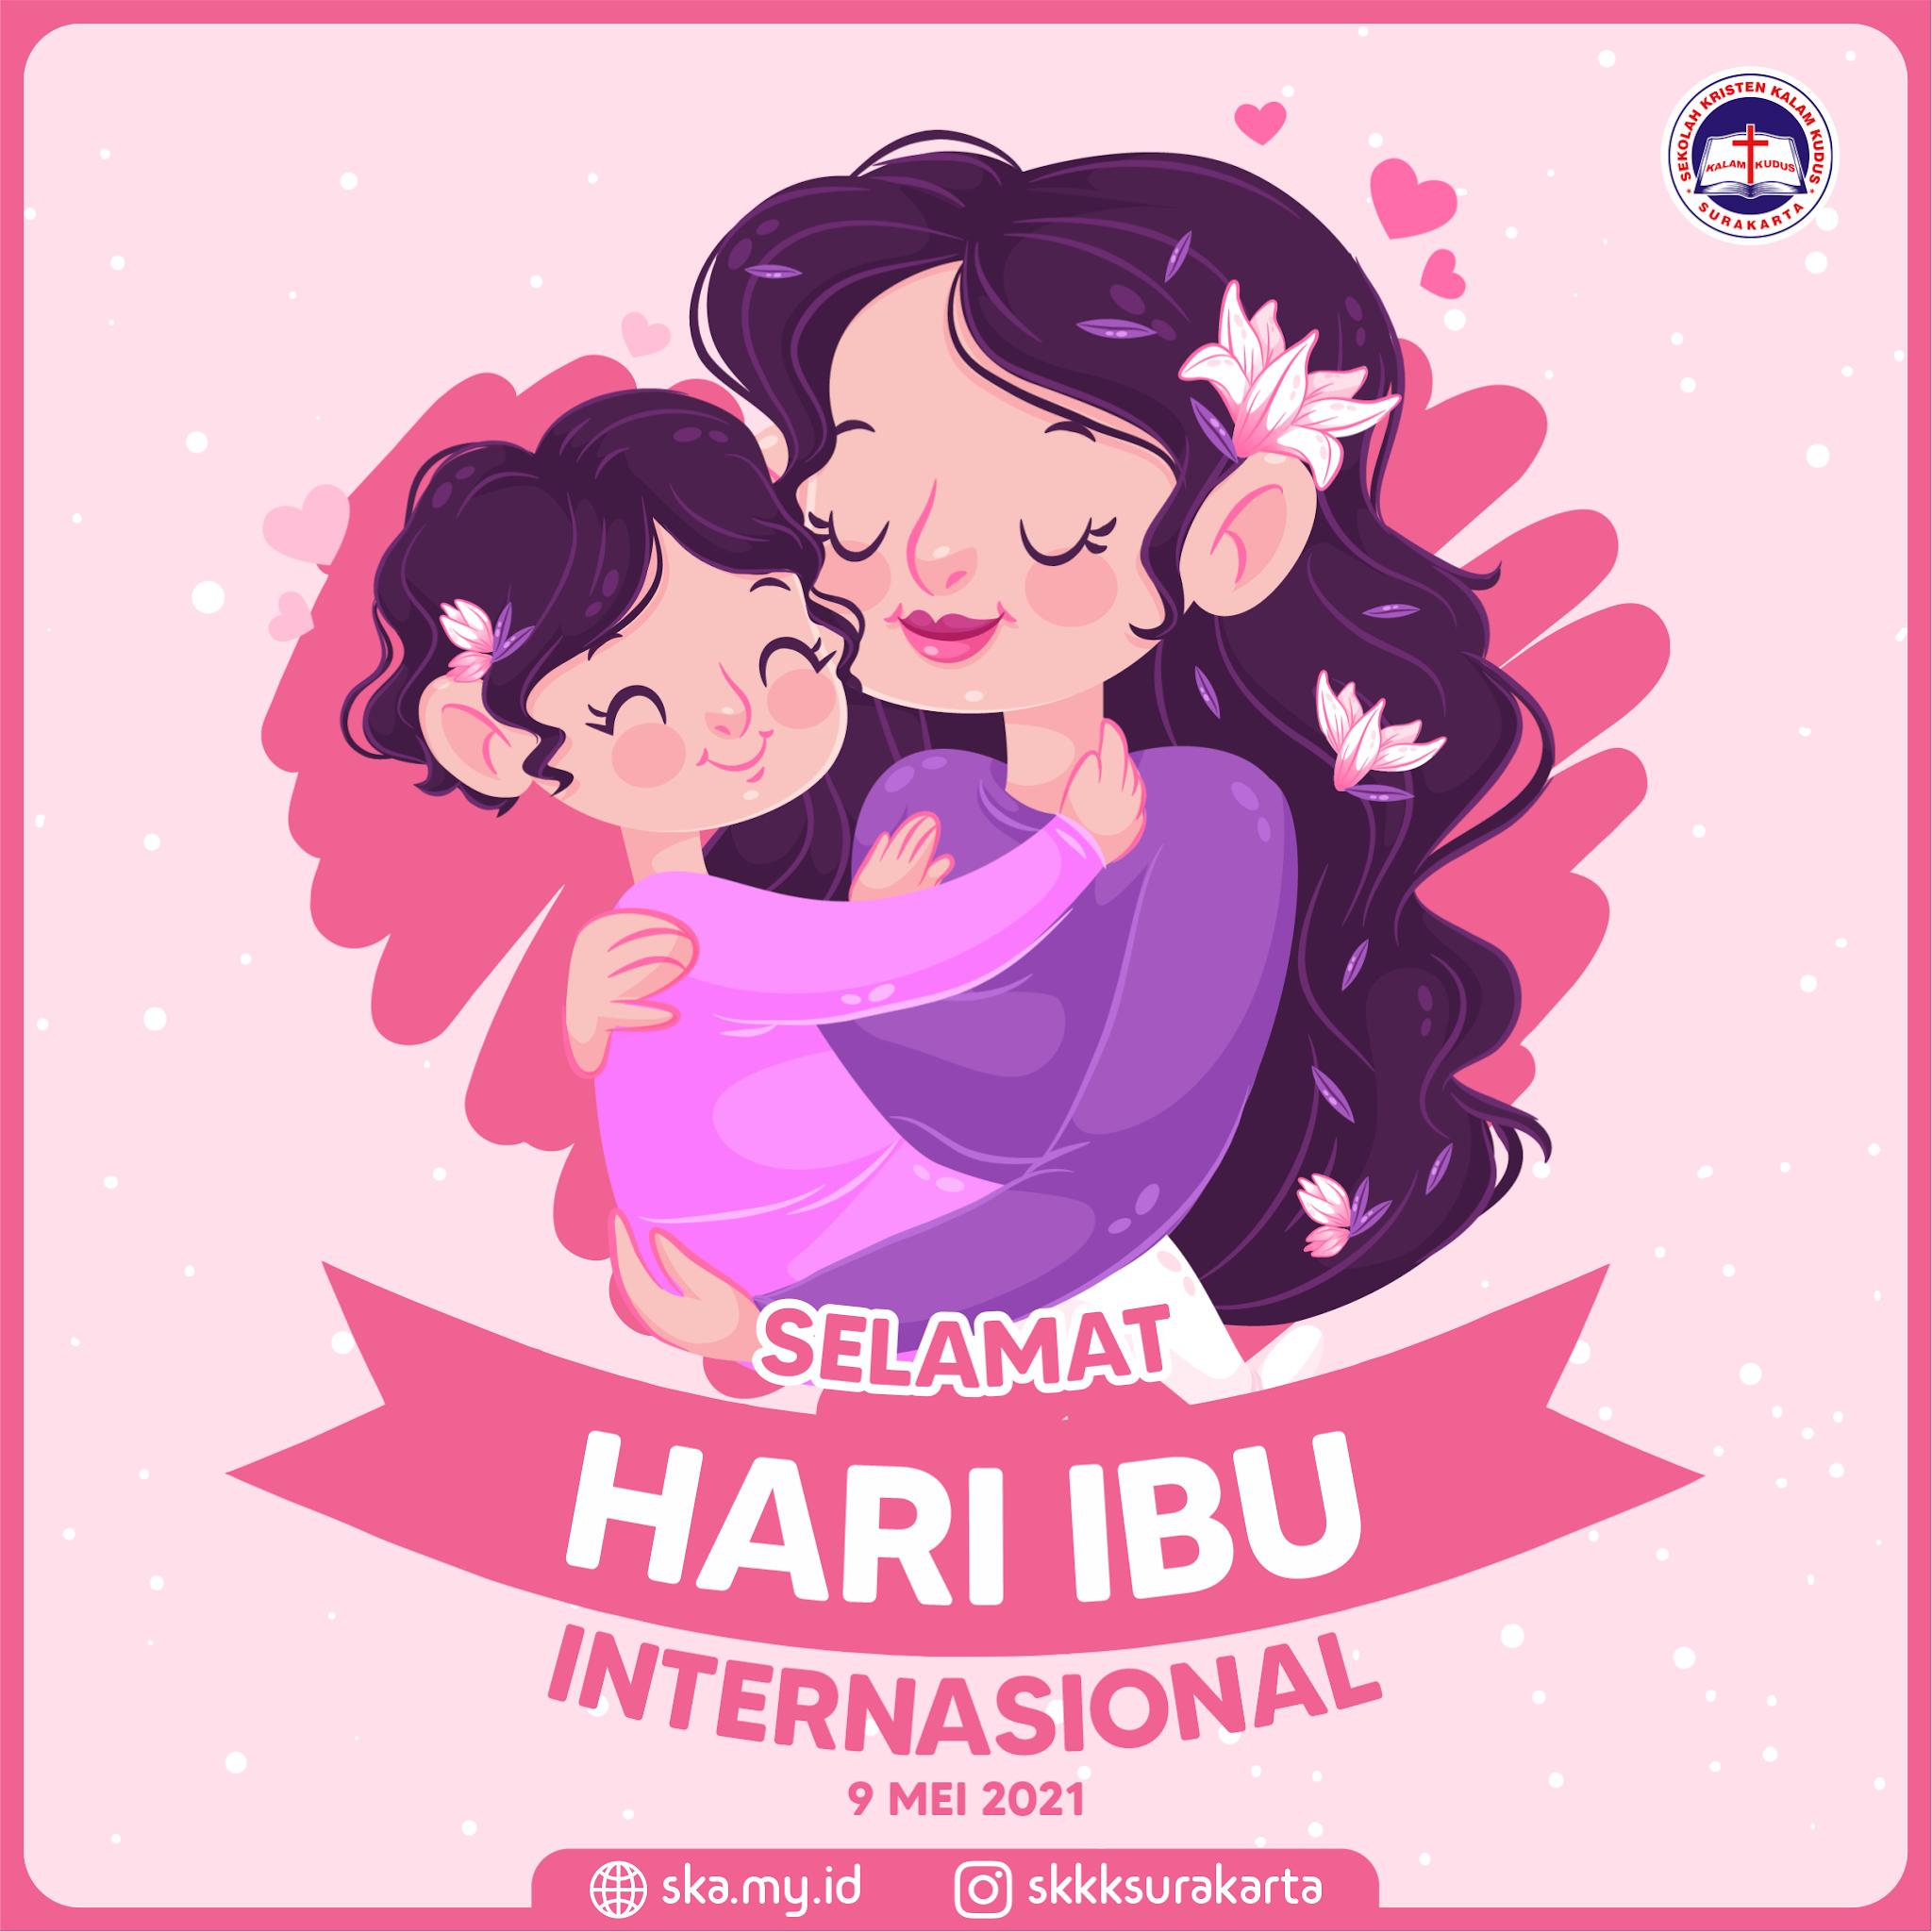 Selamat Hari Ibu Internasional